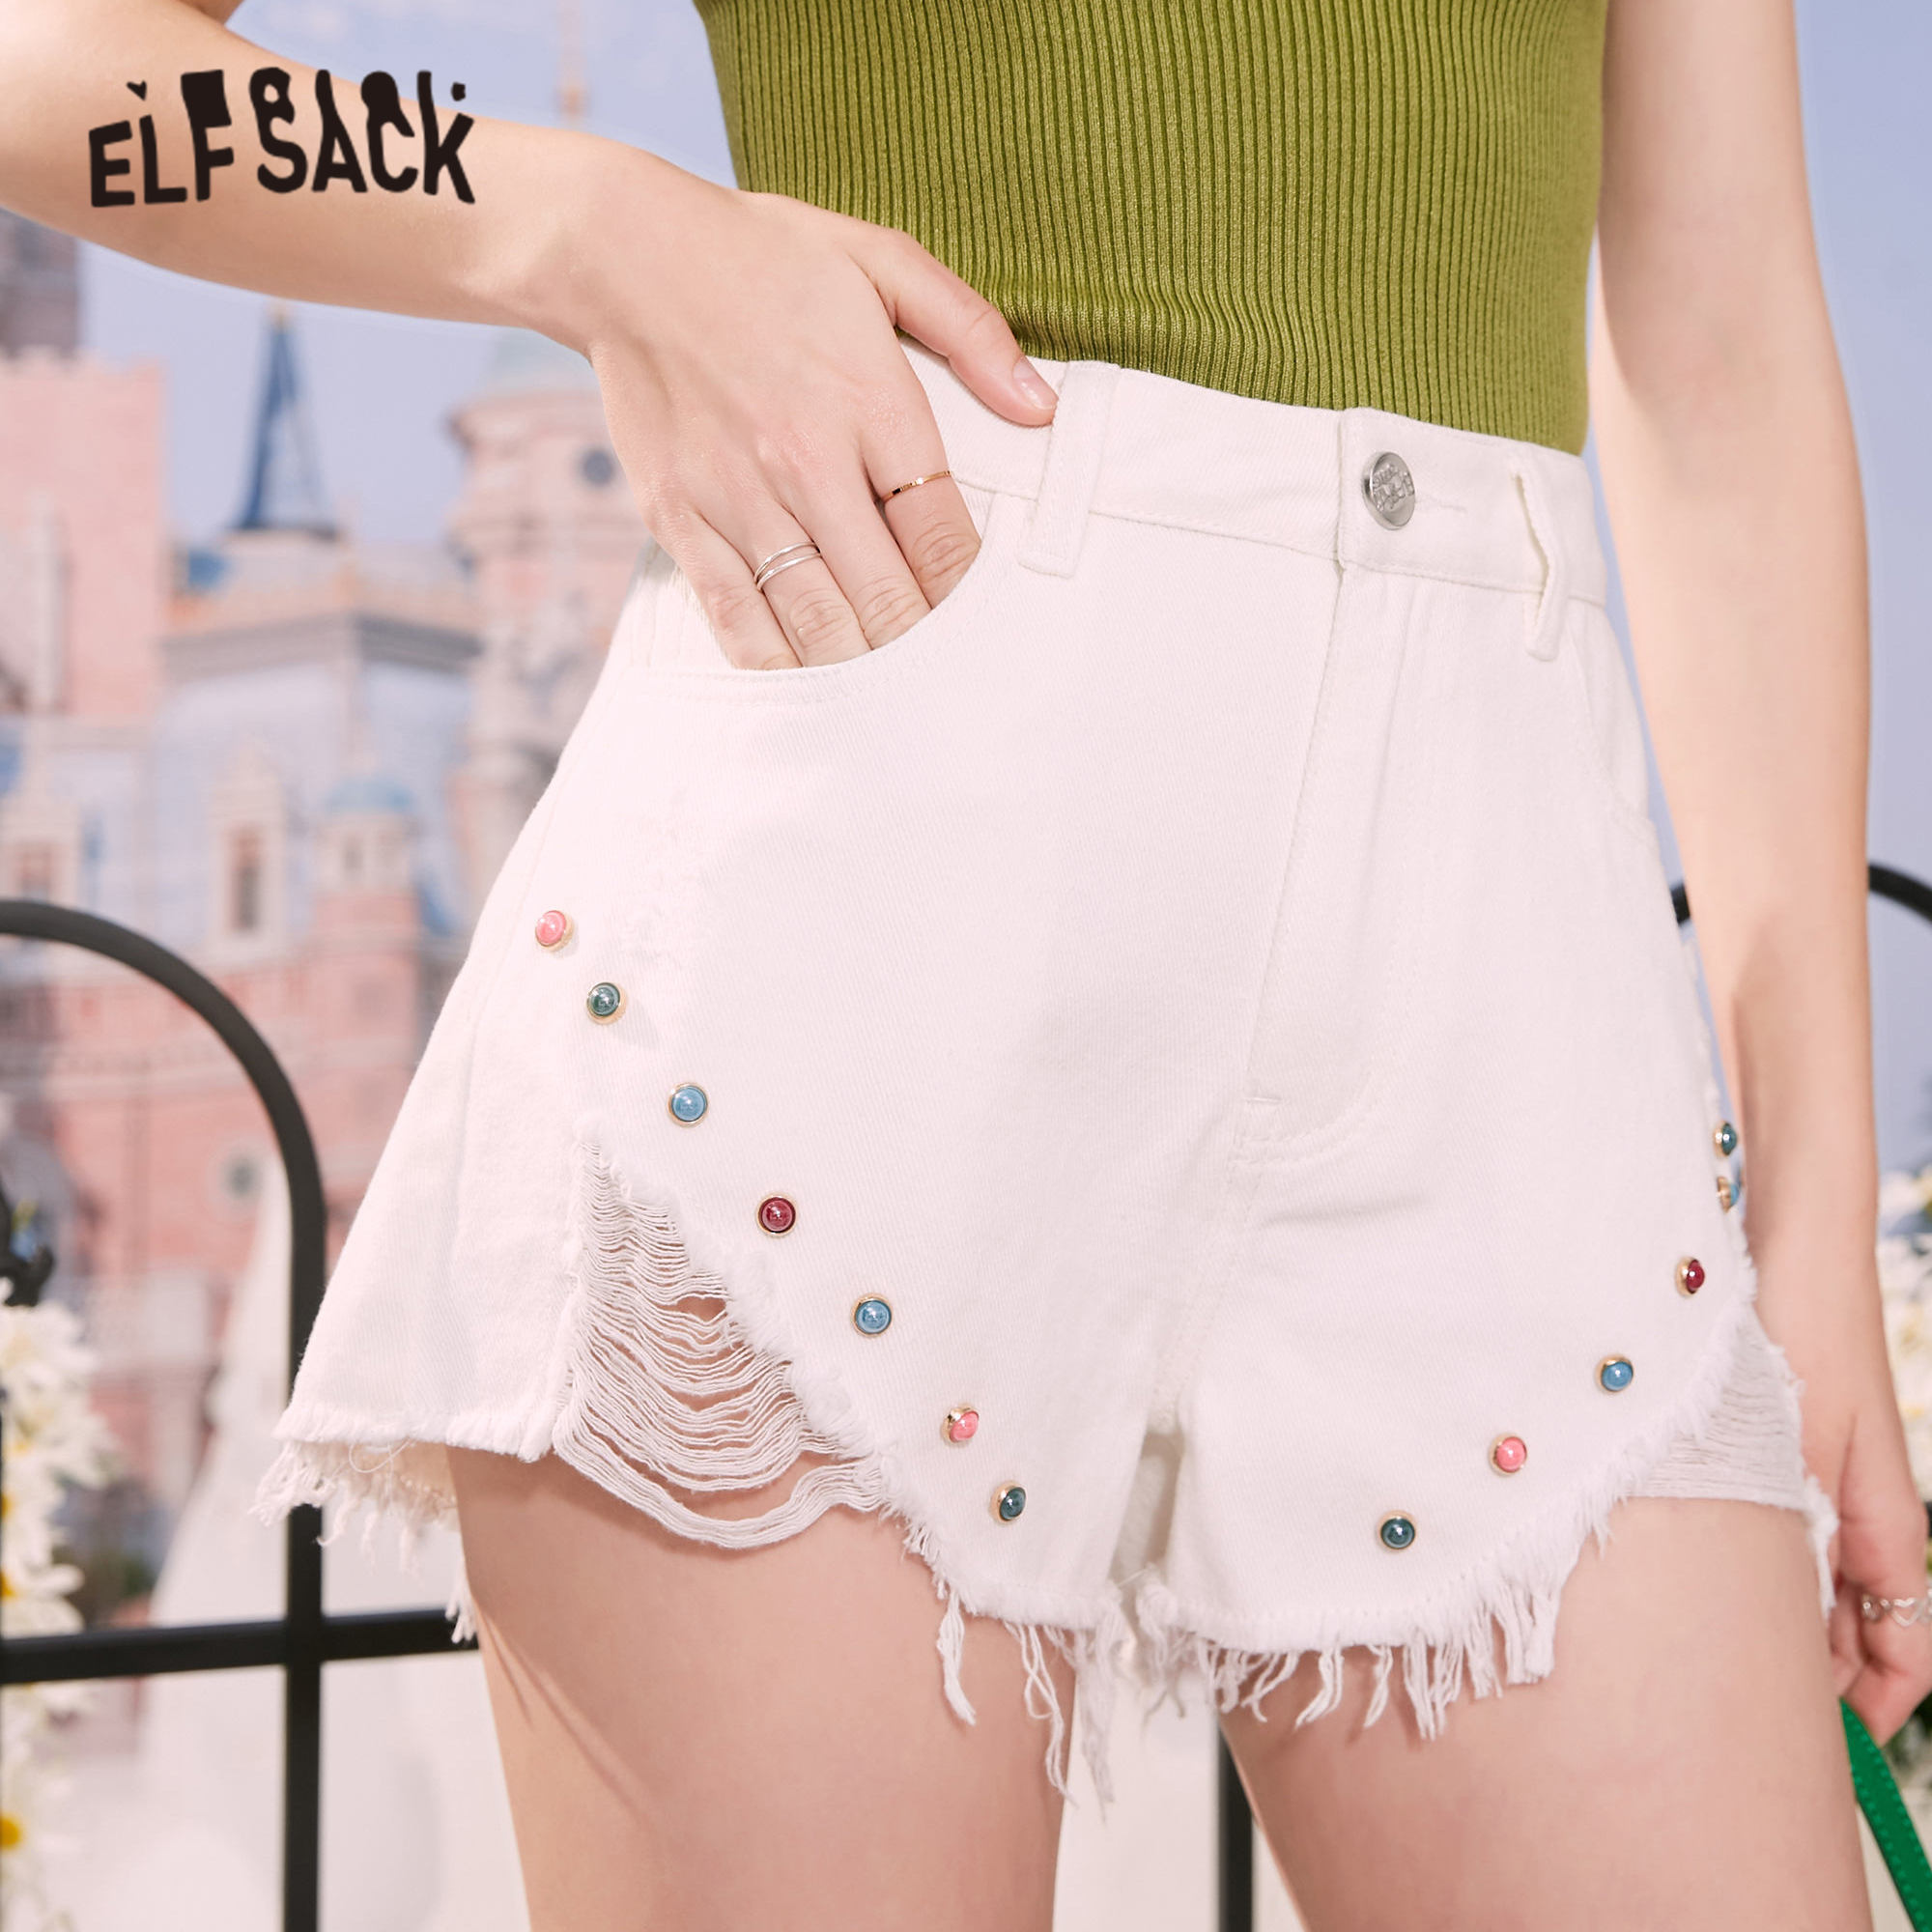 ELFSACK White Solid Raw Hem Ripped Casual Women Denim Shorts 2020 Summer Candy Beaded High Waist Korean Ladies Daily Bottoms